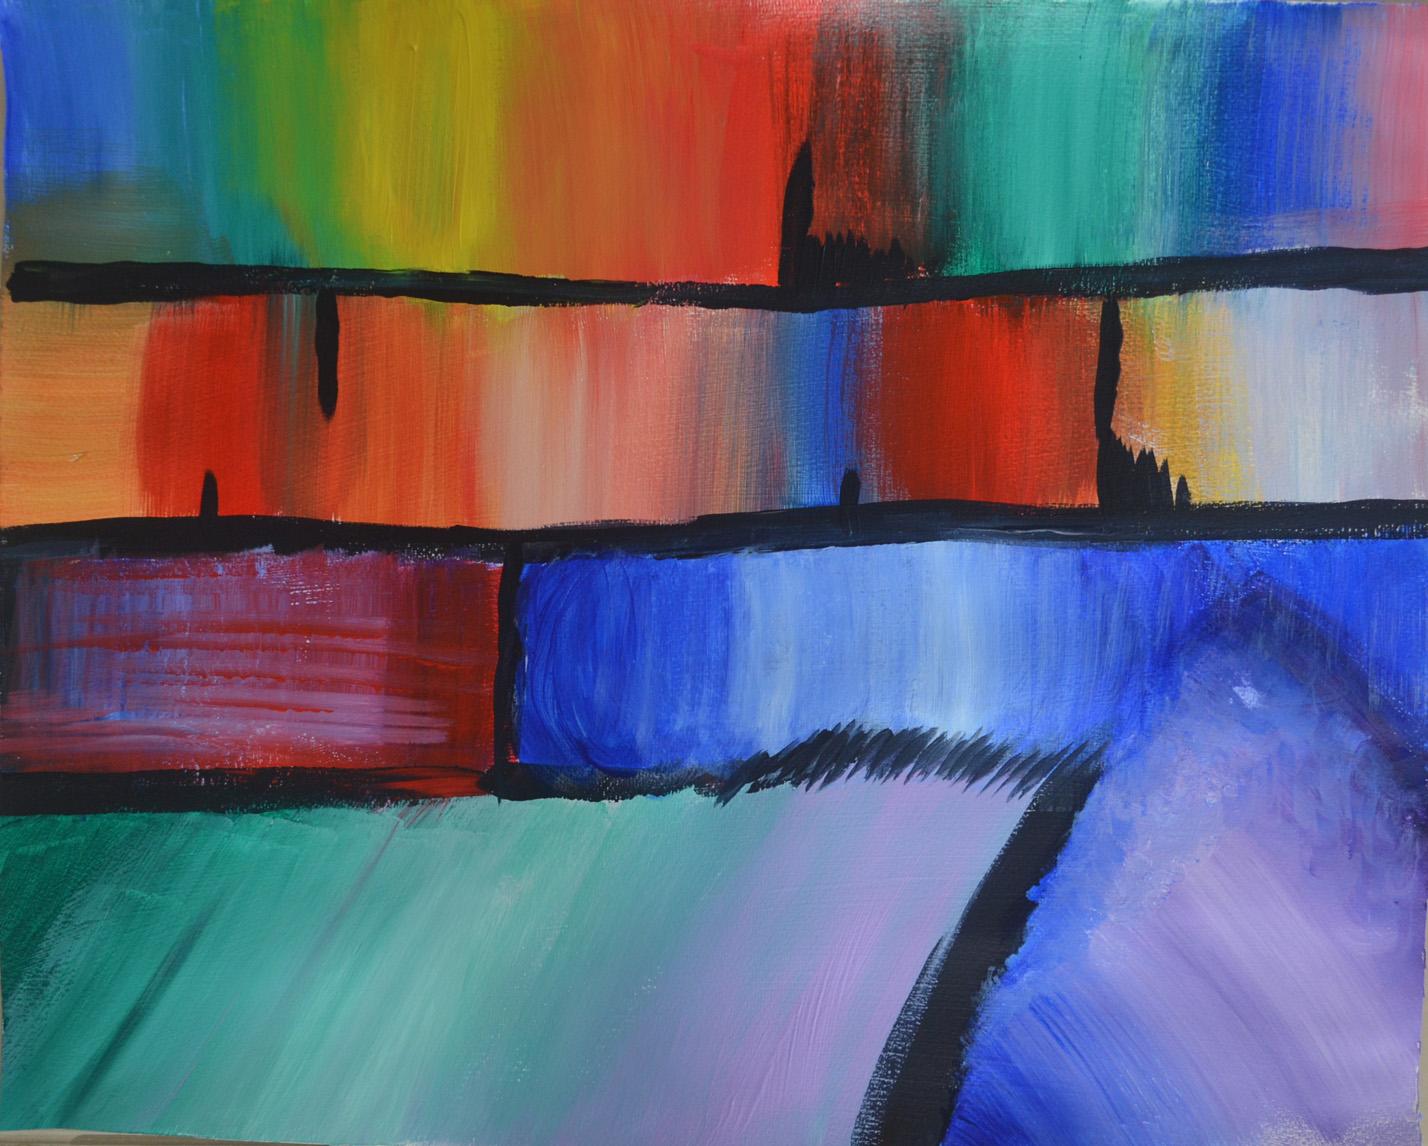 2 Transparent To Opaque Mark Smith Oca Painting 1 The